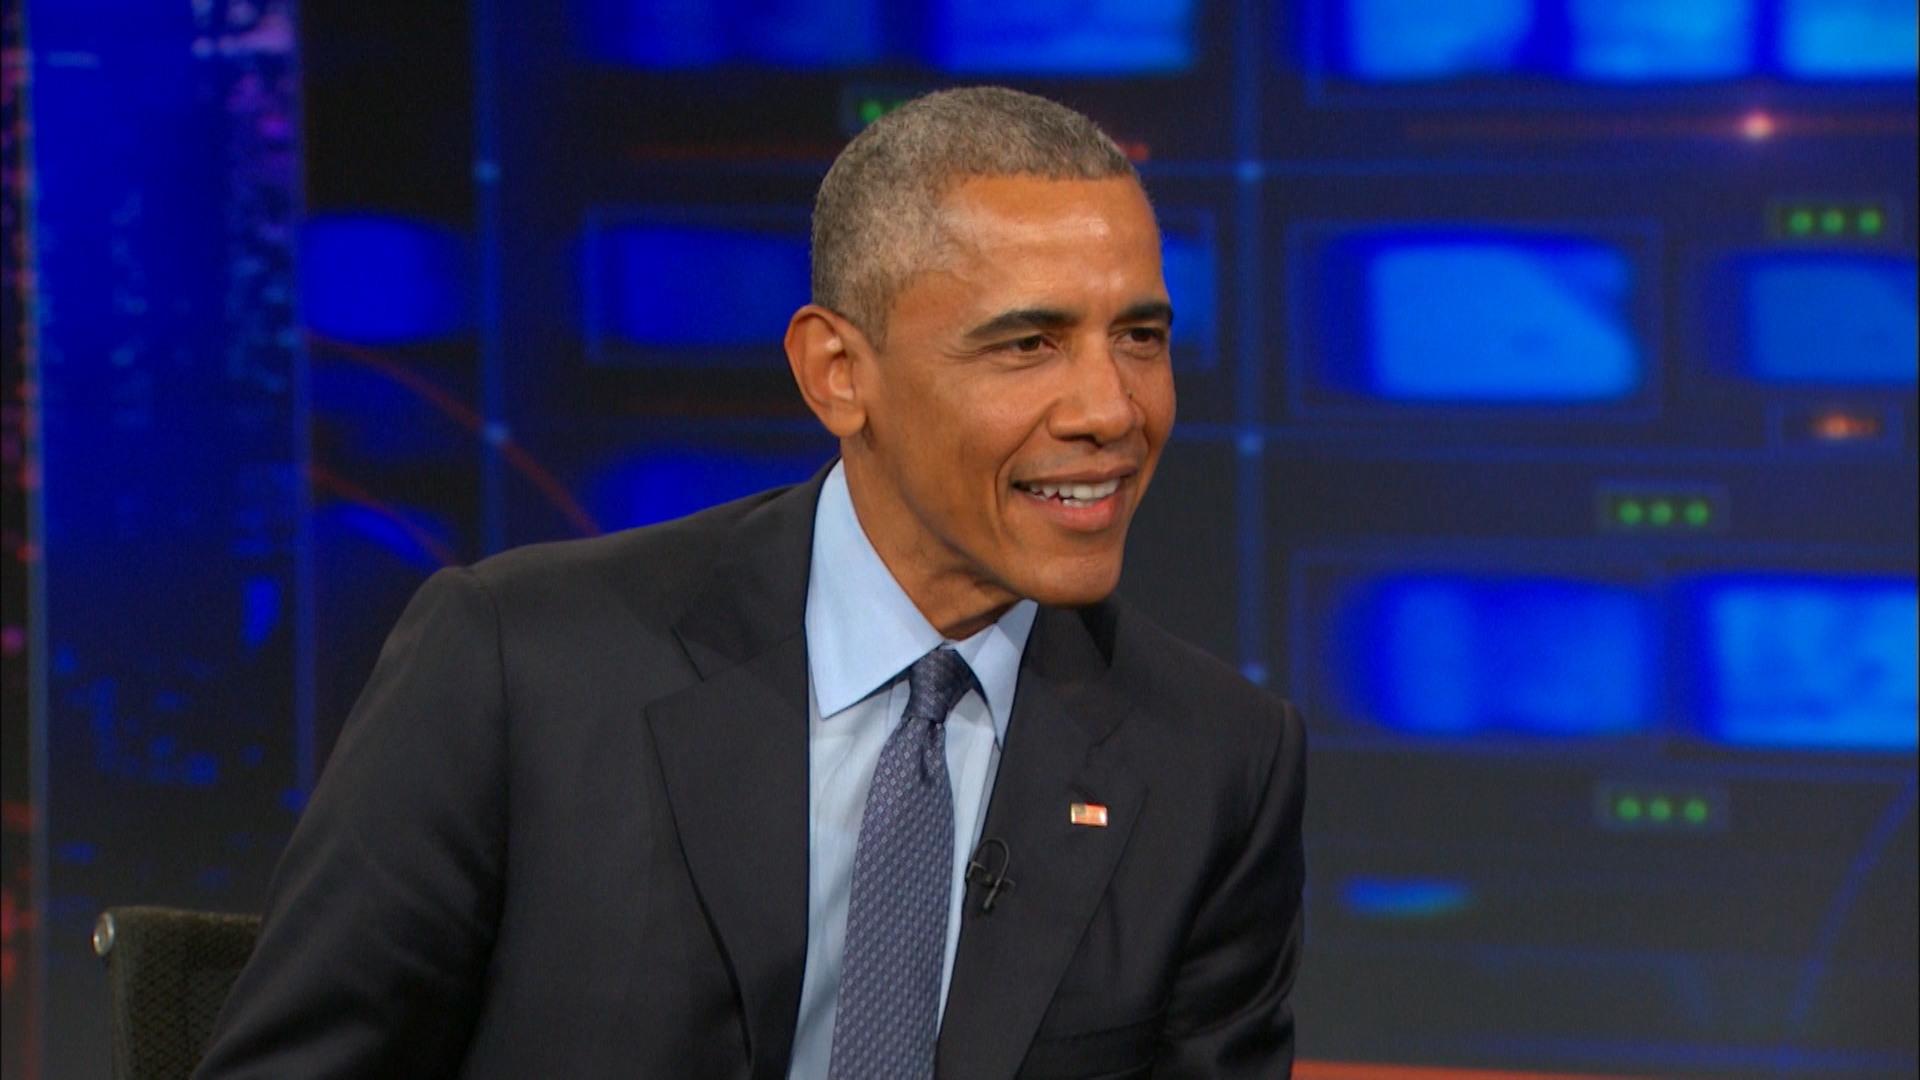 July 21, 2015 - Barack Obama